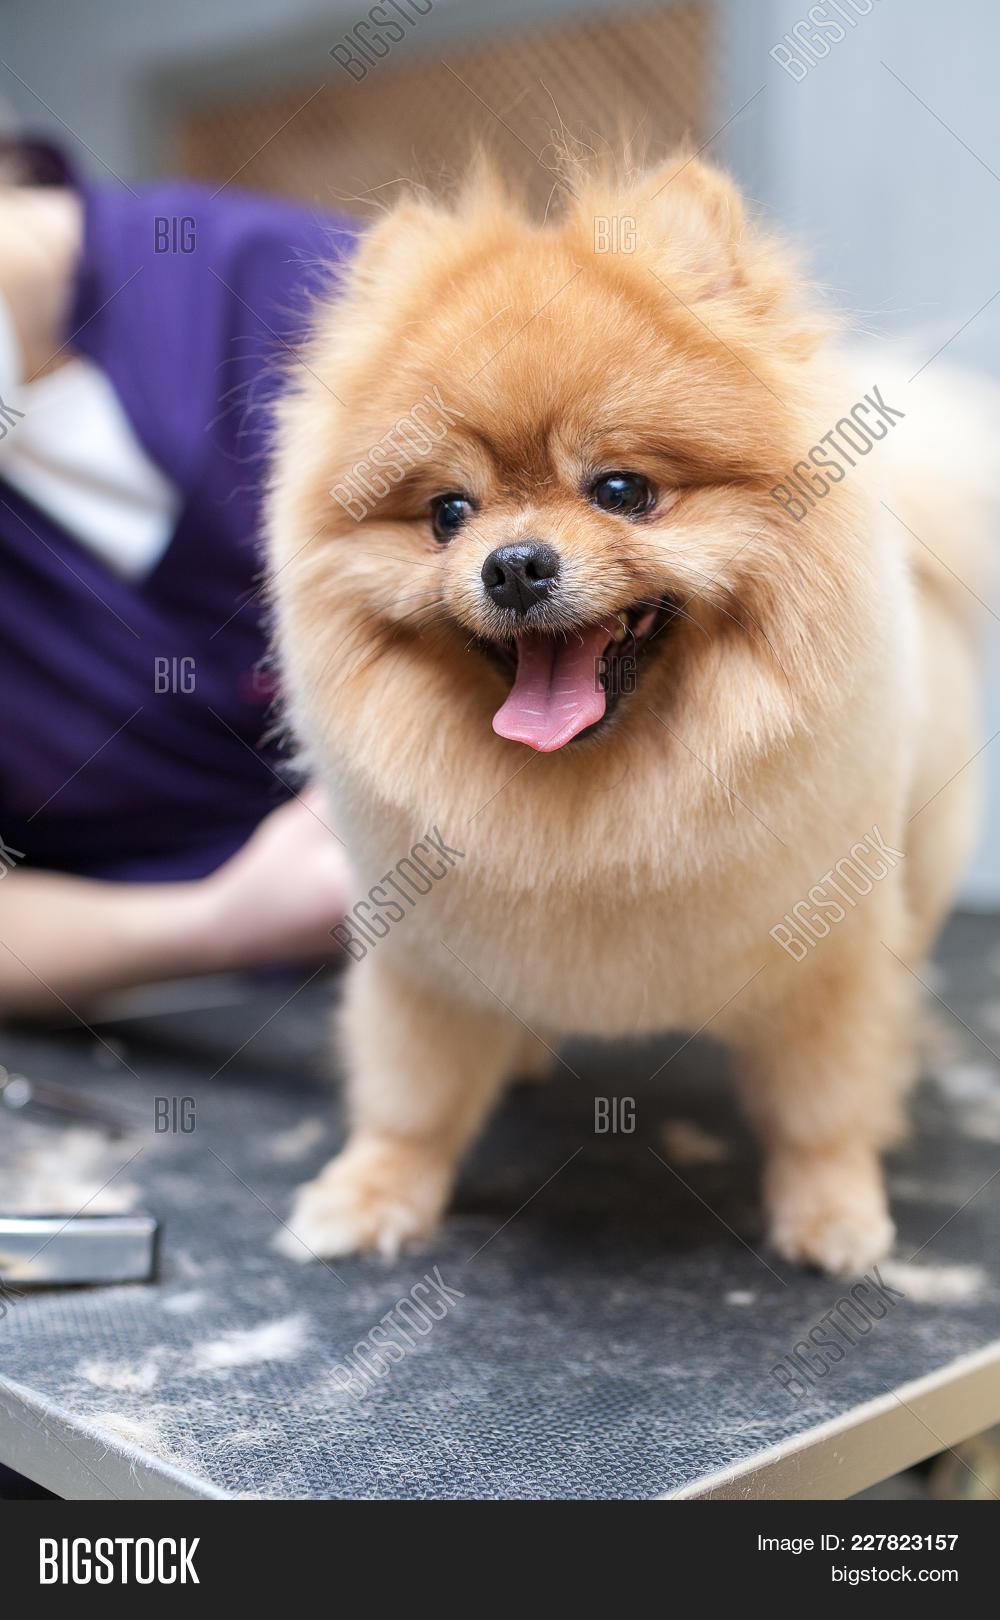 Grooming Dog Haircut Image Photo Bigstock